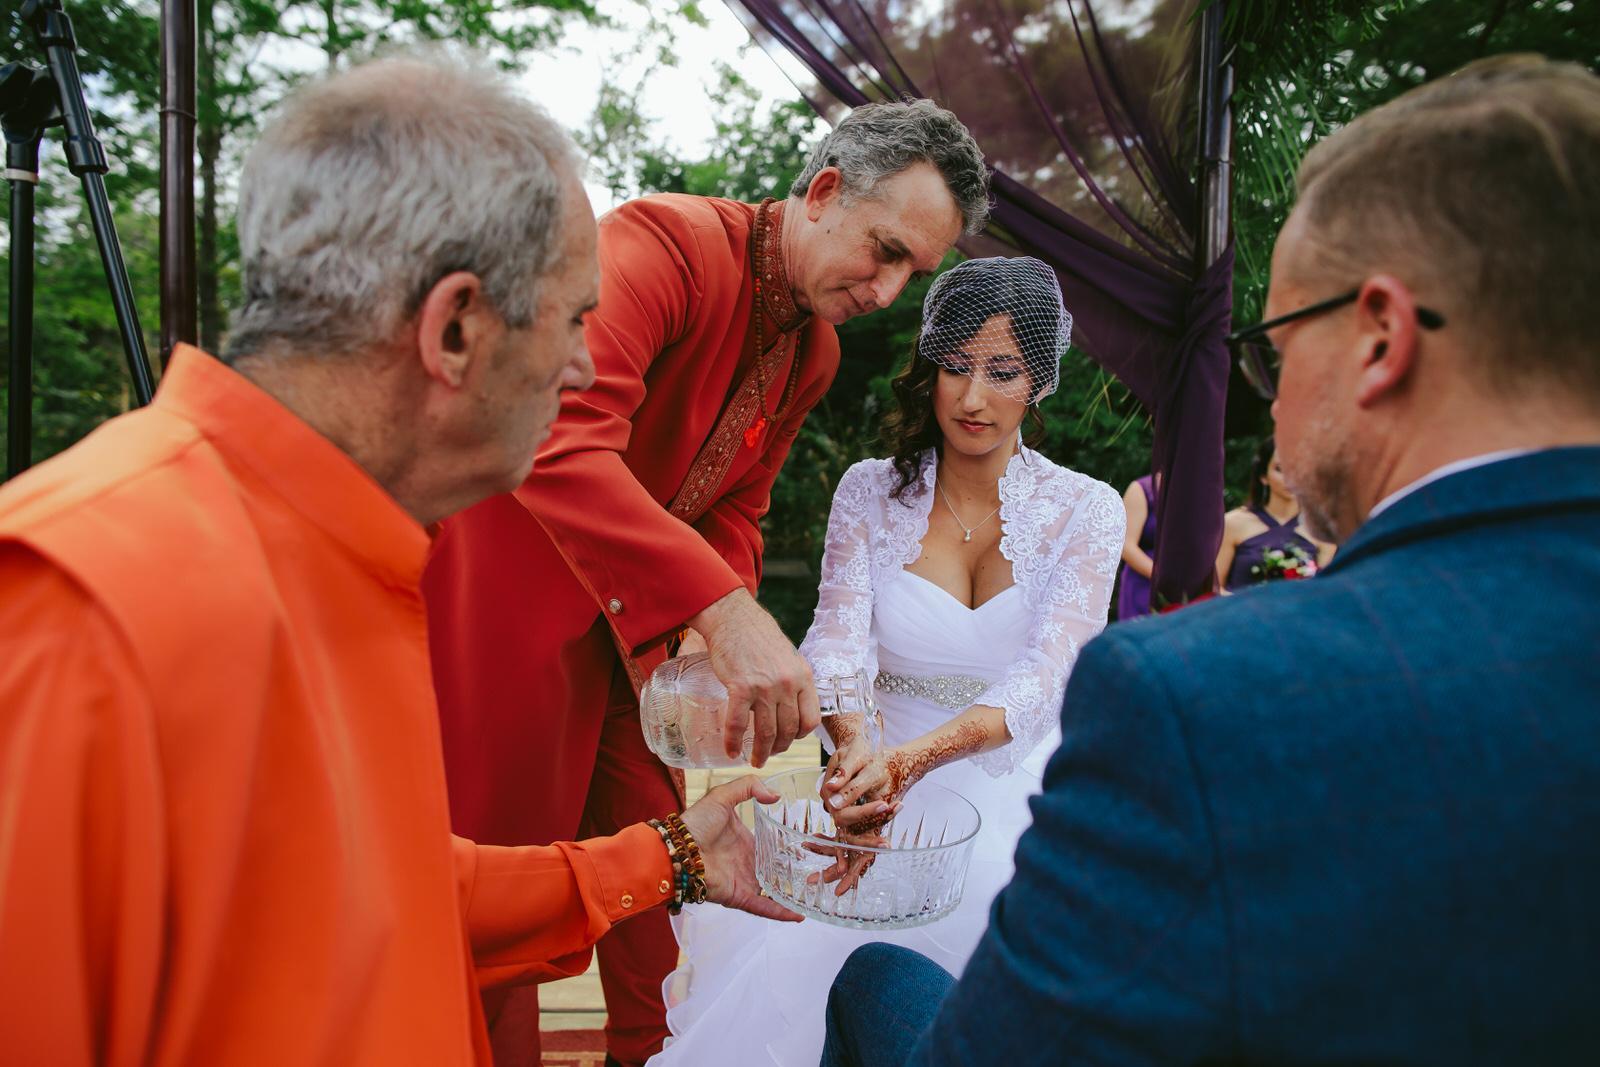 kashi-ashram-wedding-ceremony-sebastian-florida-tiny-house-photo-42.jpg